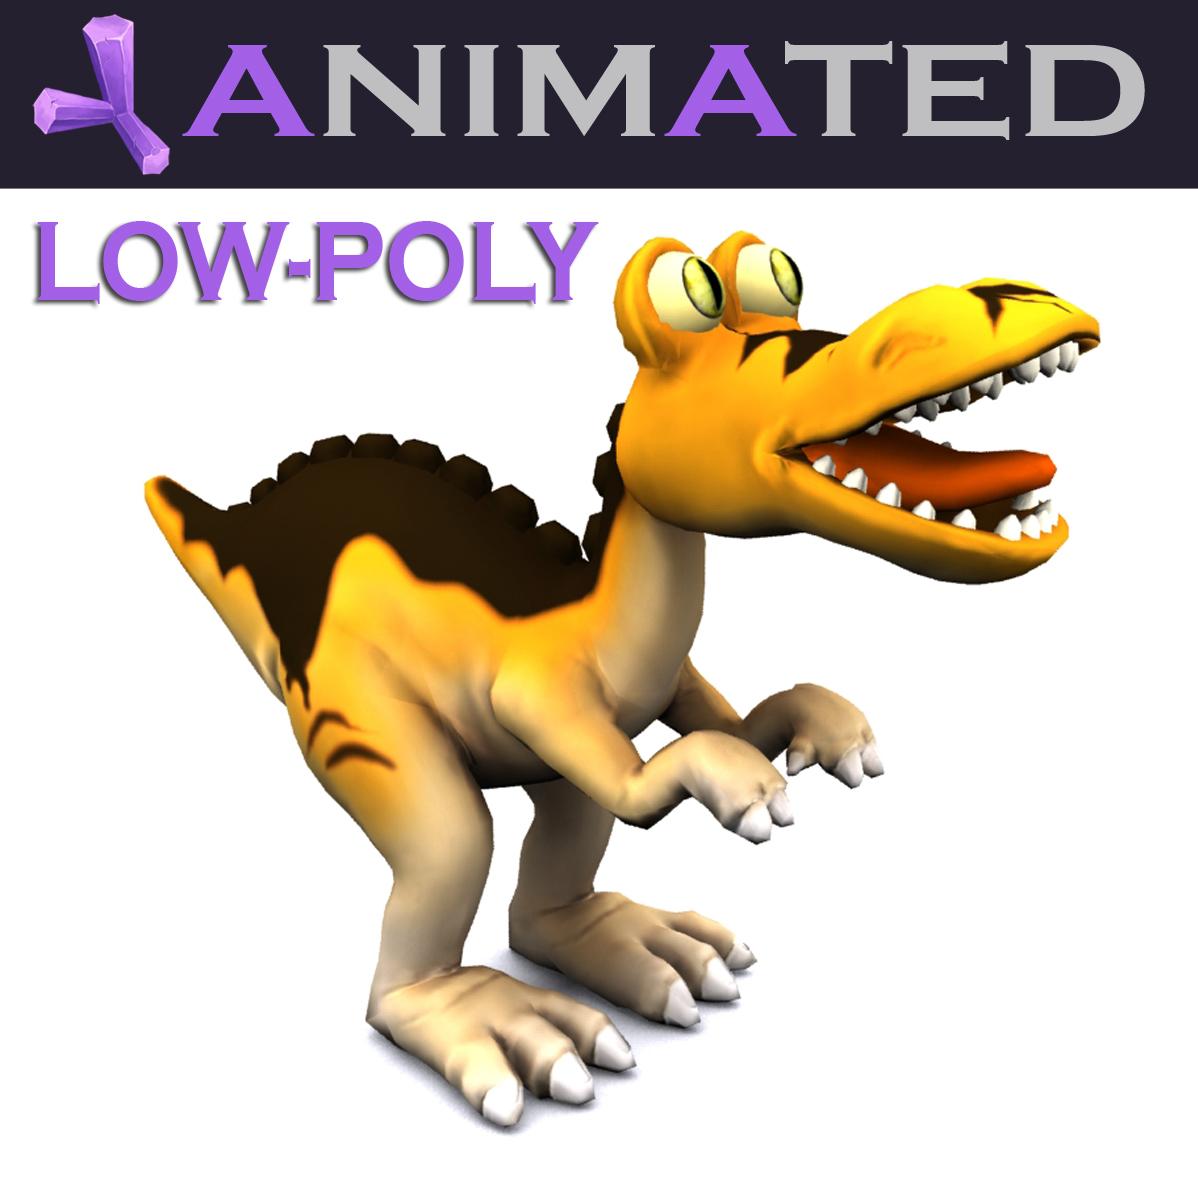 Cartoon Tyrannosaurus 3d model max fbx obj 212426